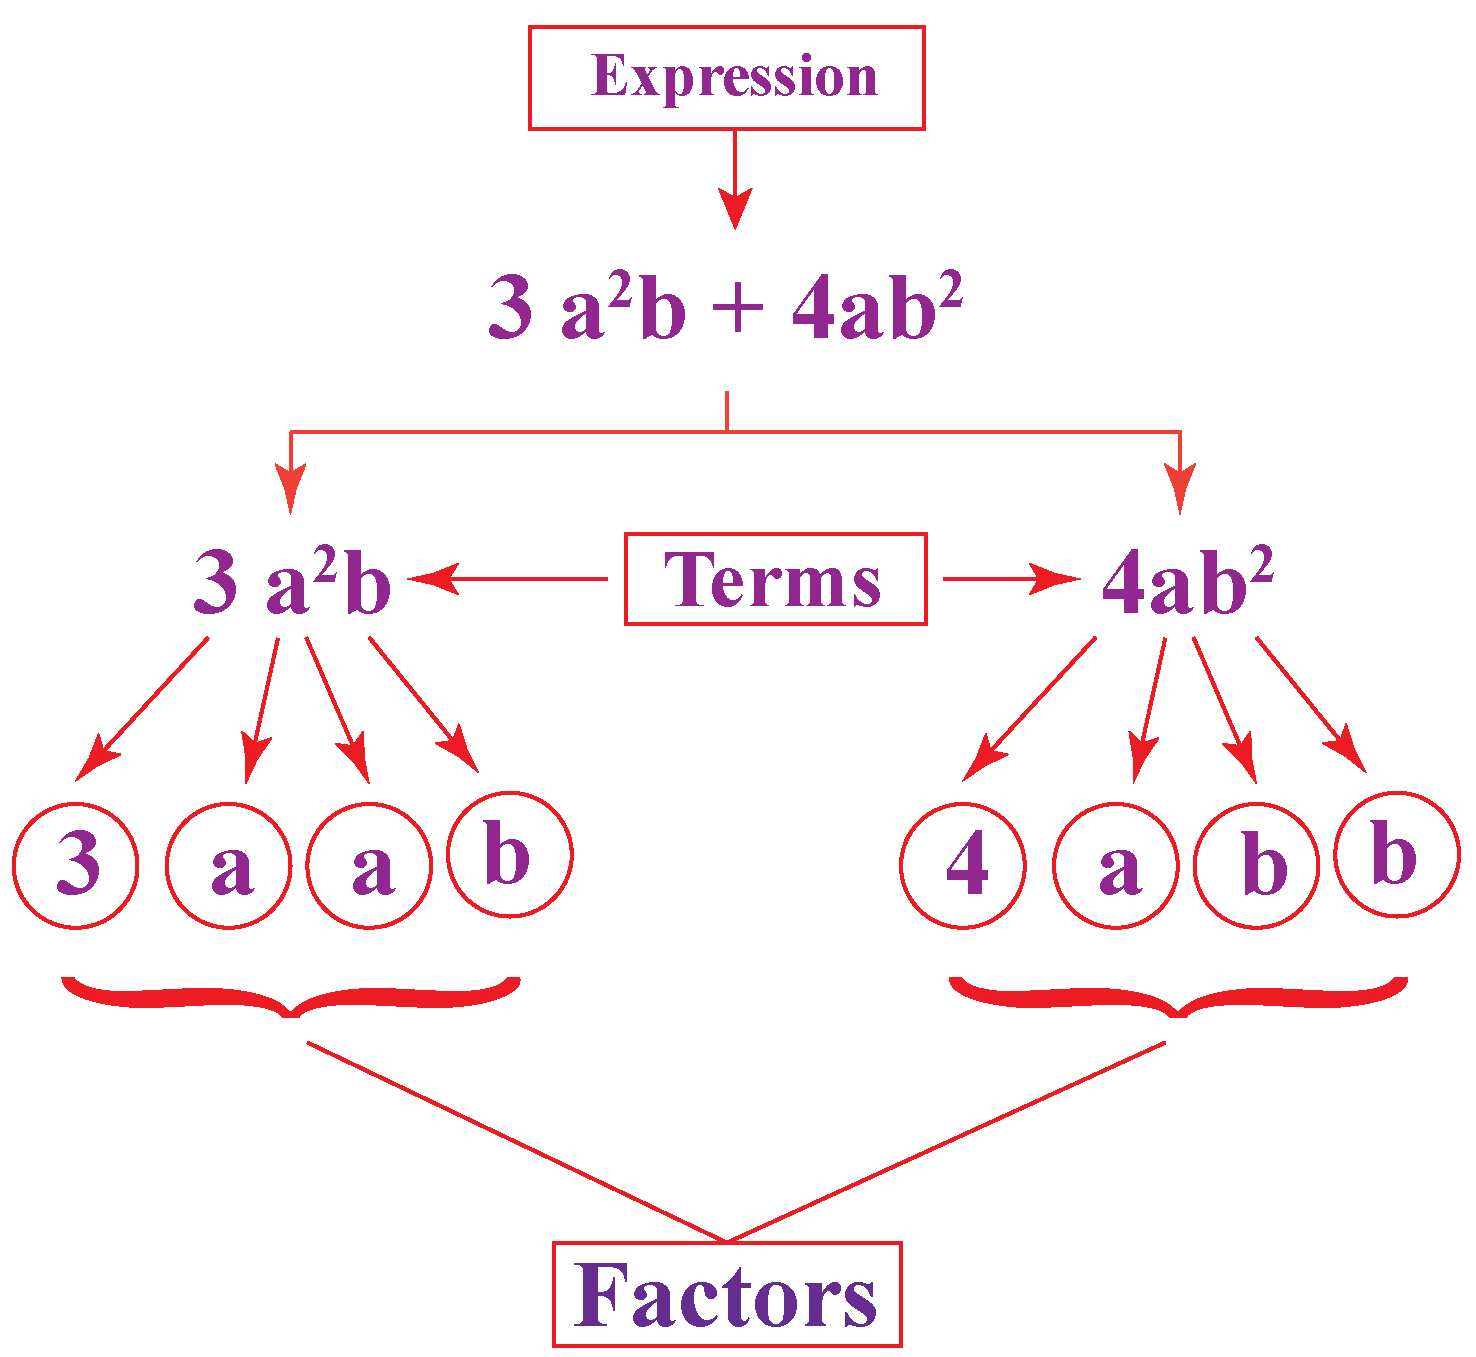 Factorisation of polynomials